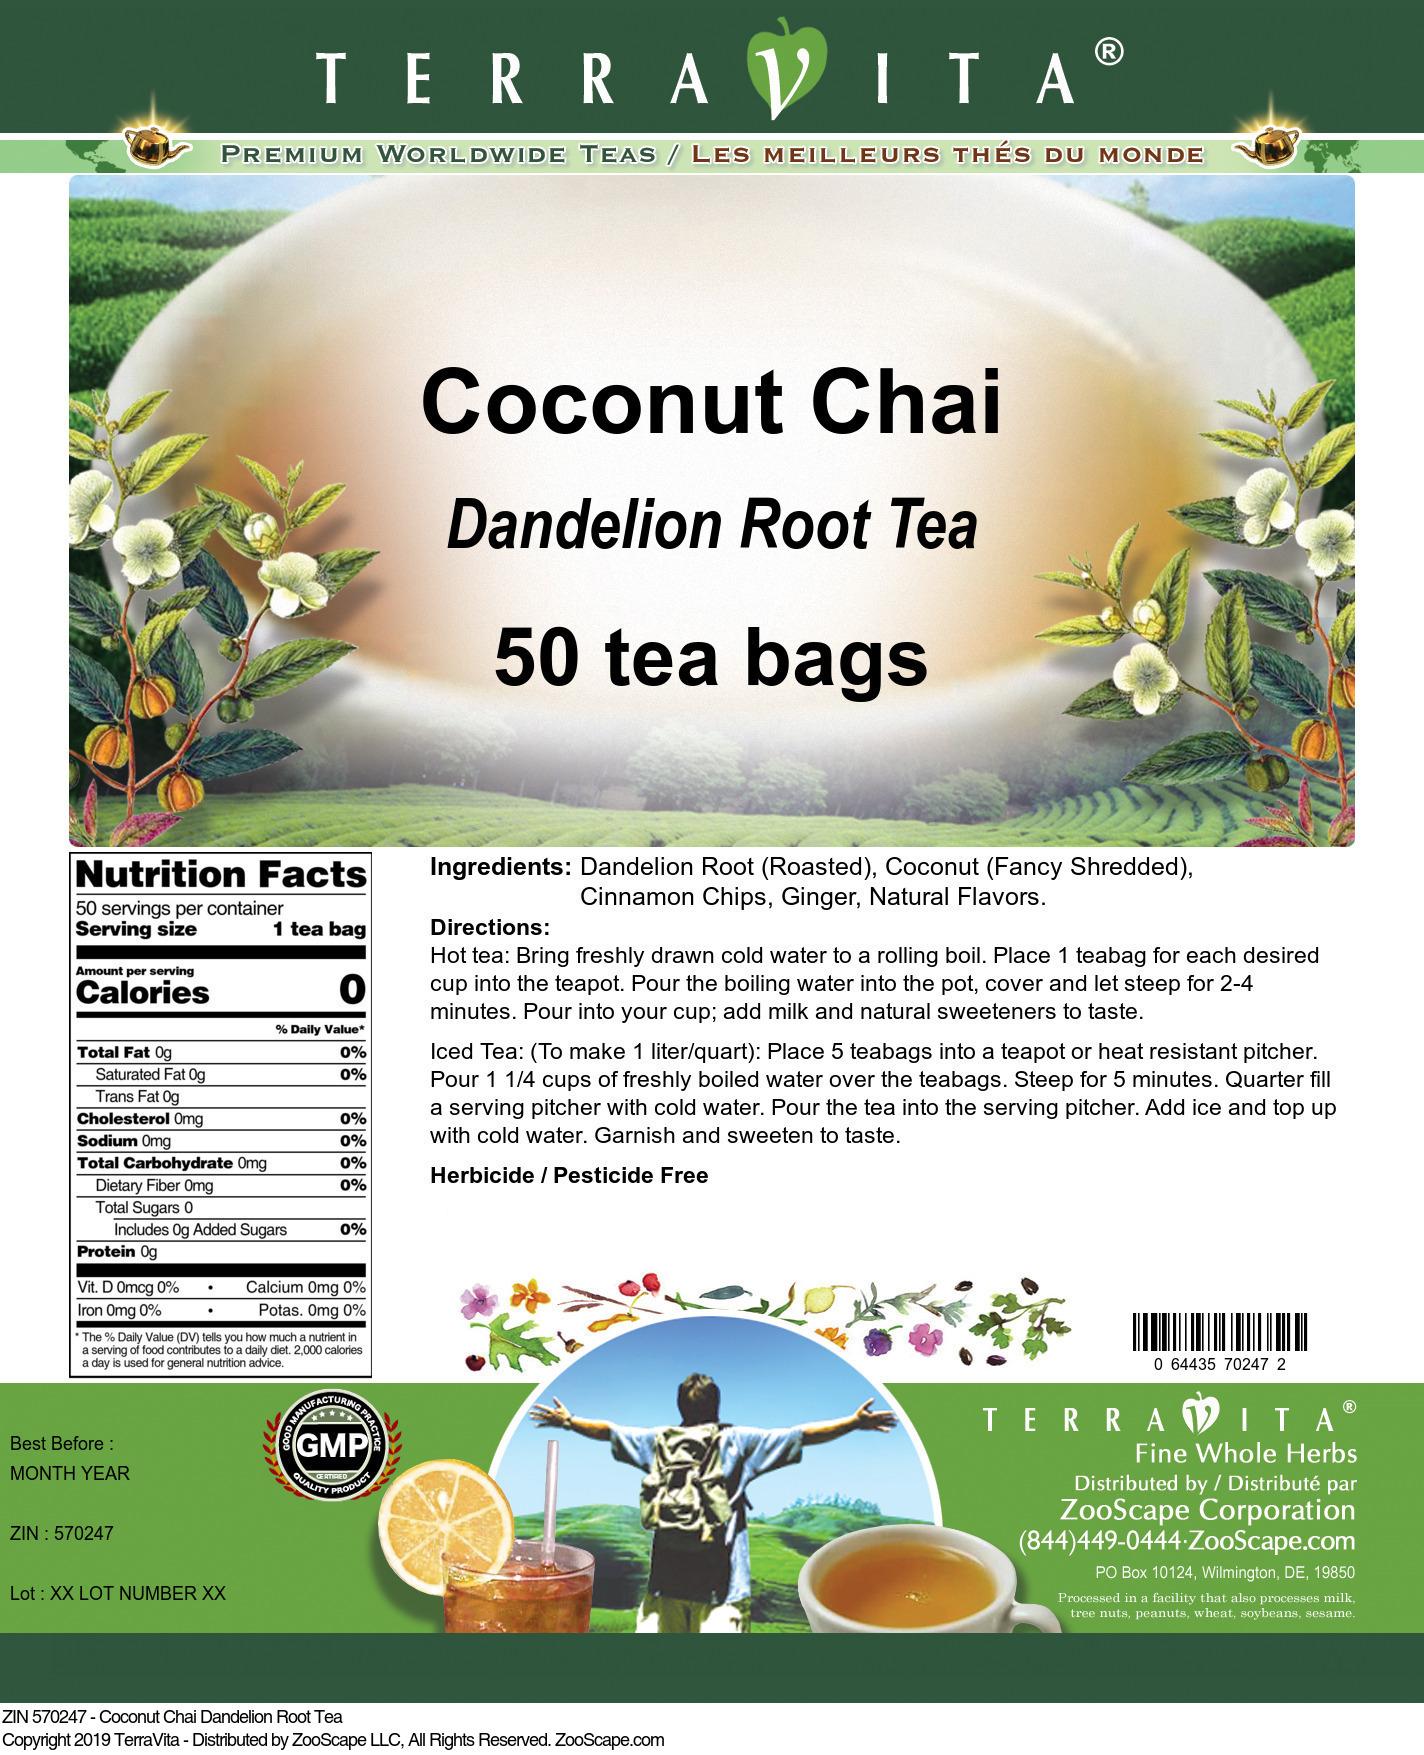 Coconut Chai Dandelion Root Tea